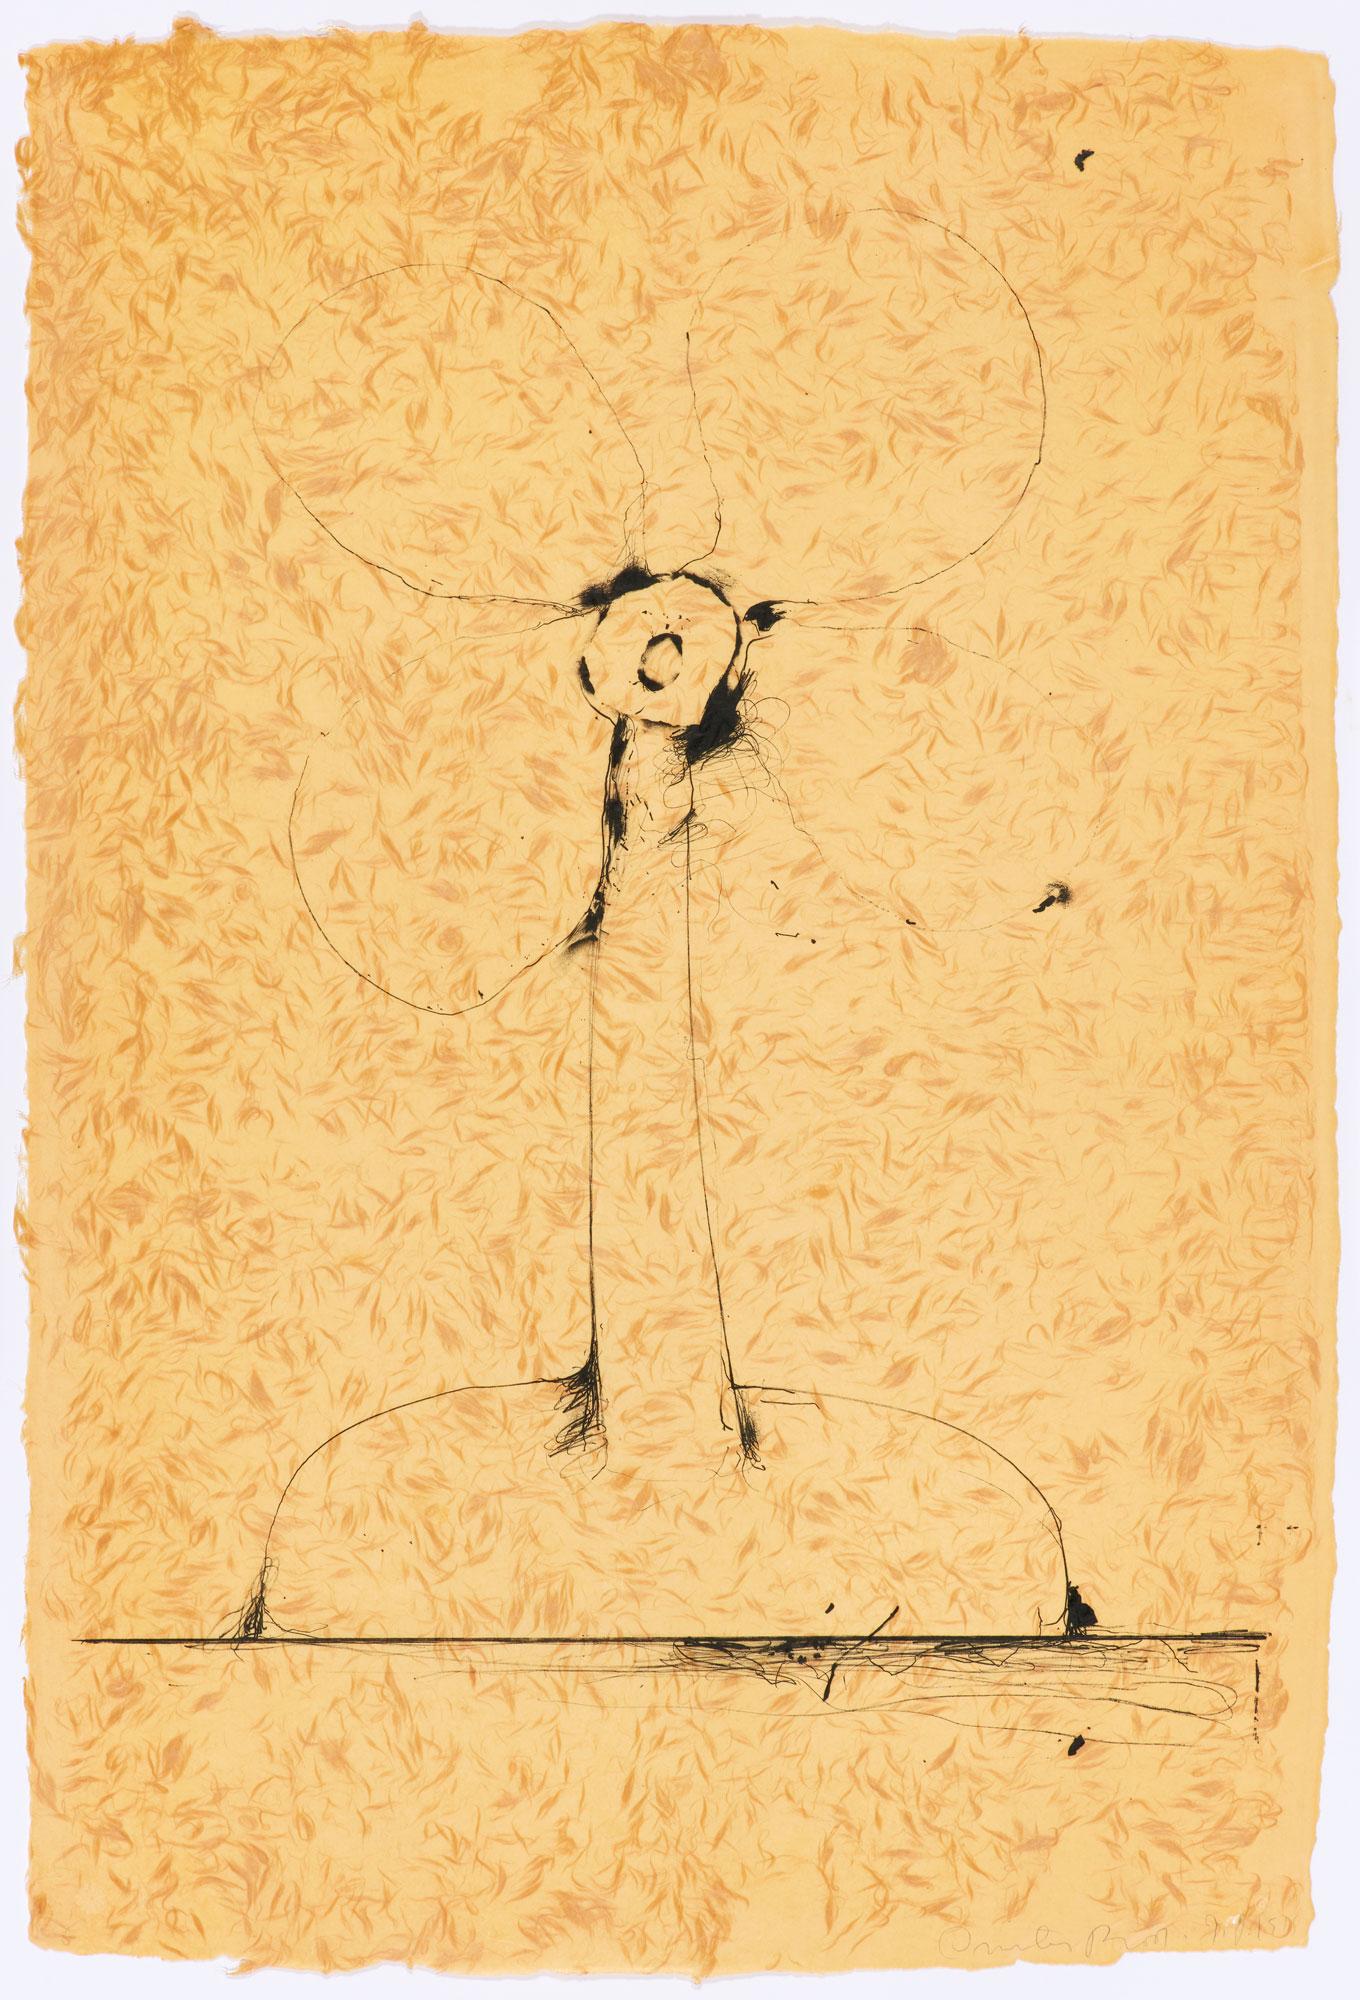 Jim Dine Artists Usf Graphicstudio Institute For